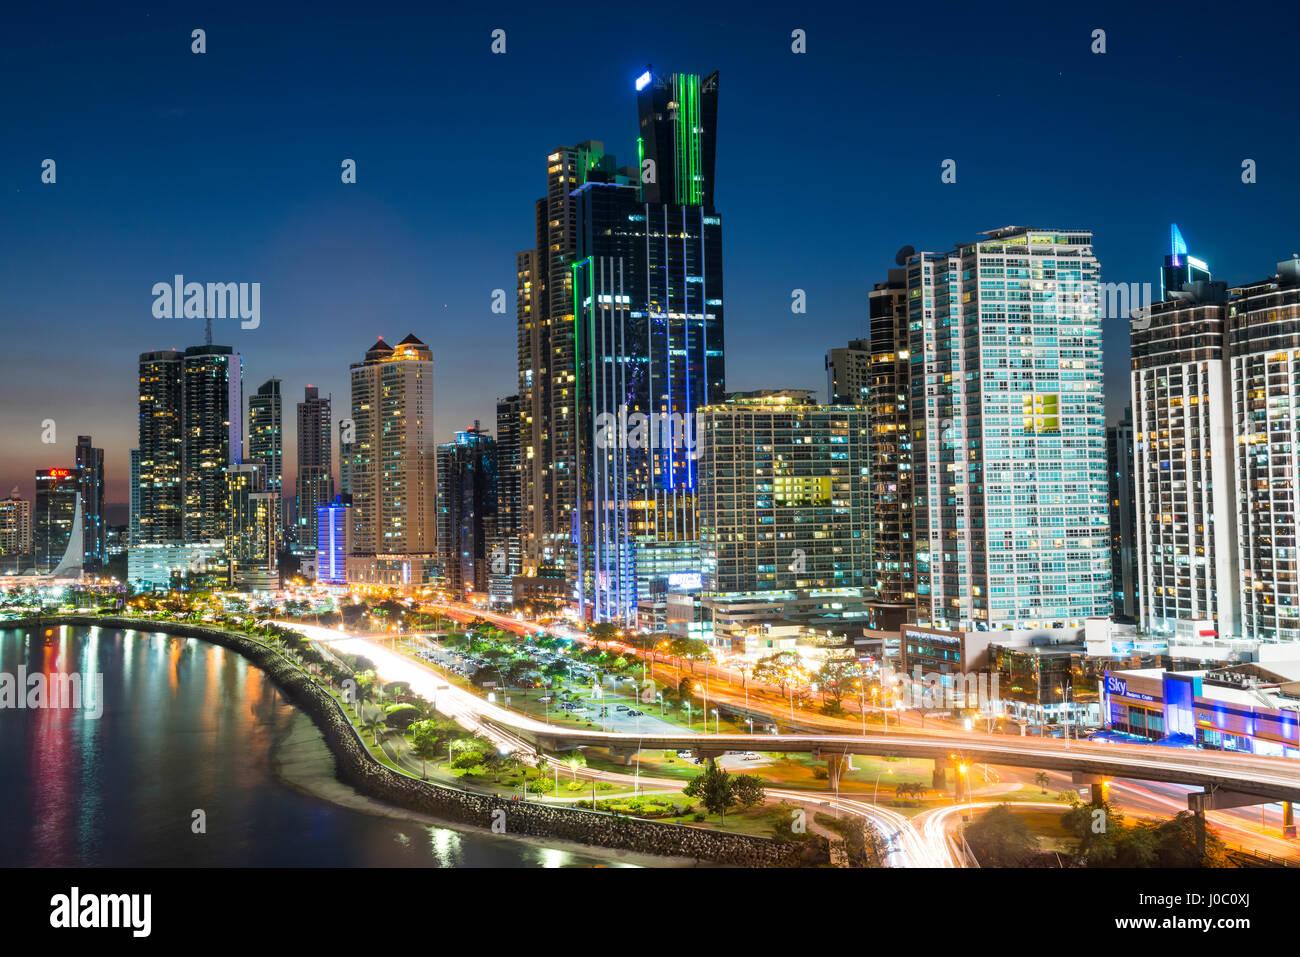 Die Skyline von Panama-Stadt bei Nacht, Panama City, Panama, Mittelamerika Stockbild